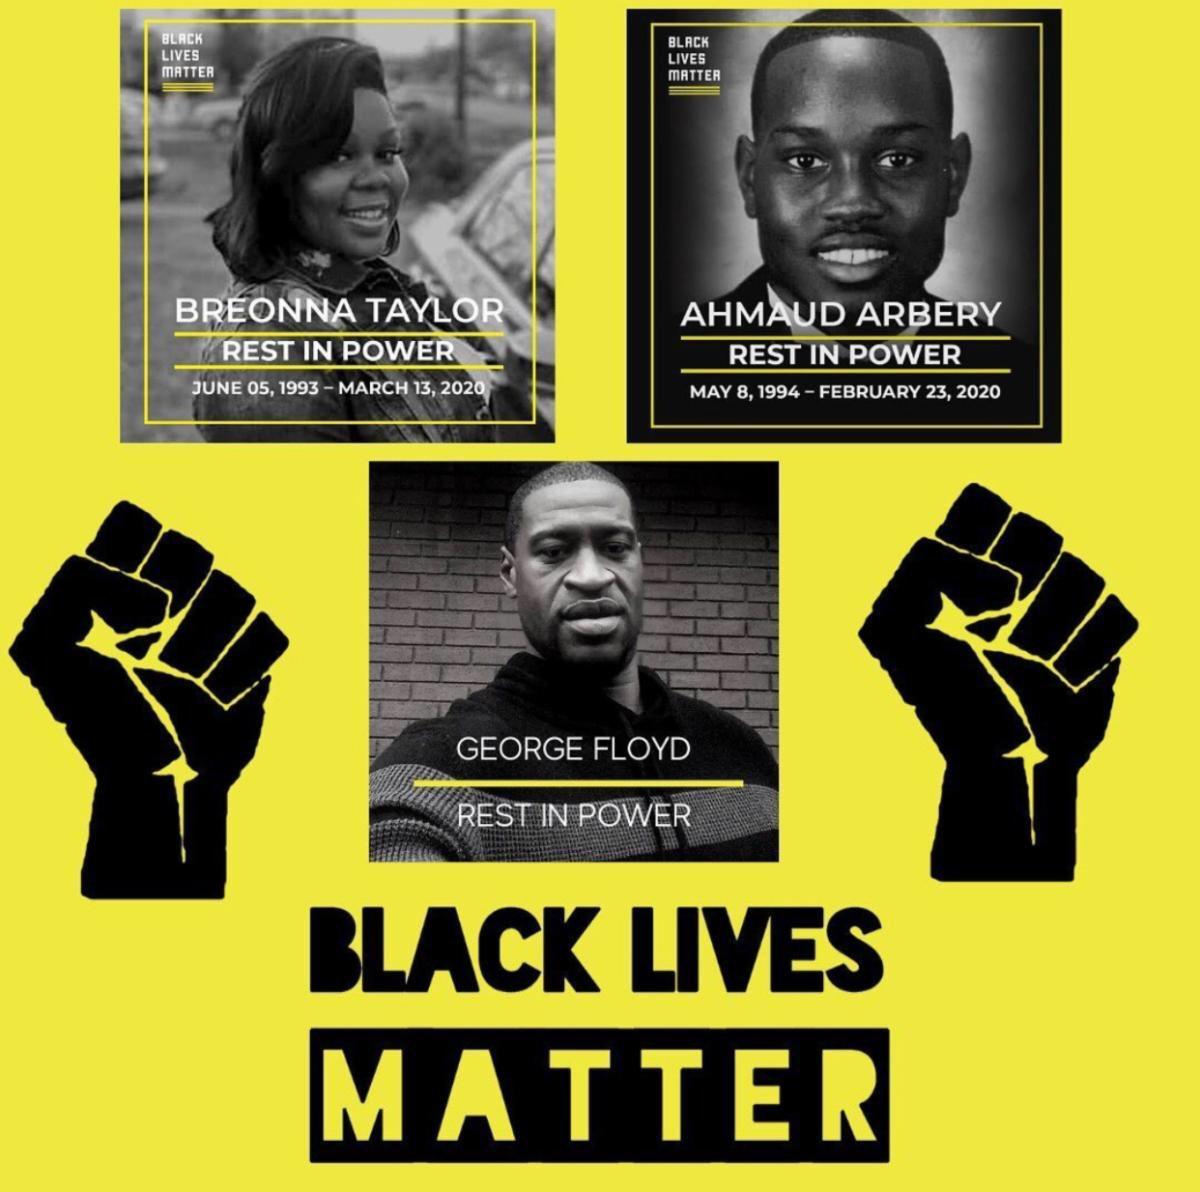 donate to #BlackLivesMatter now. https://t.co/s8Ff9nYXjp https://t.co/F9fJZbHCyE